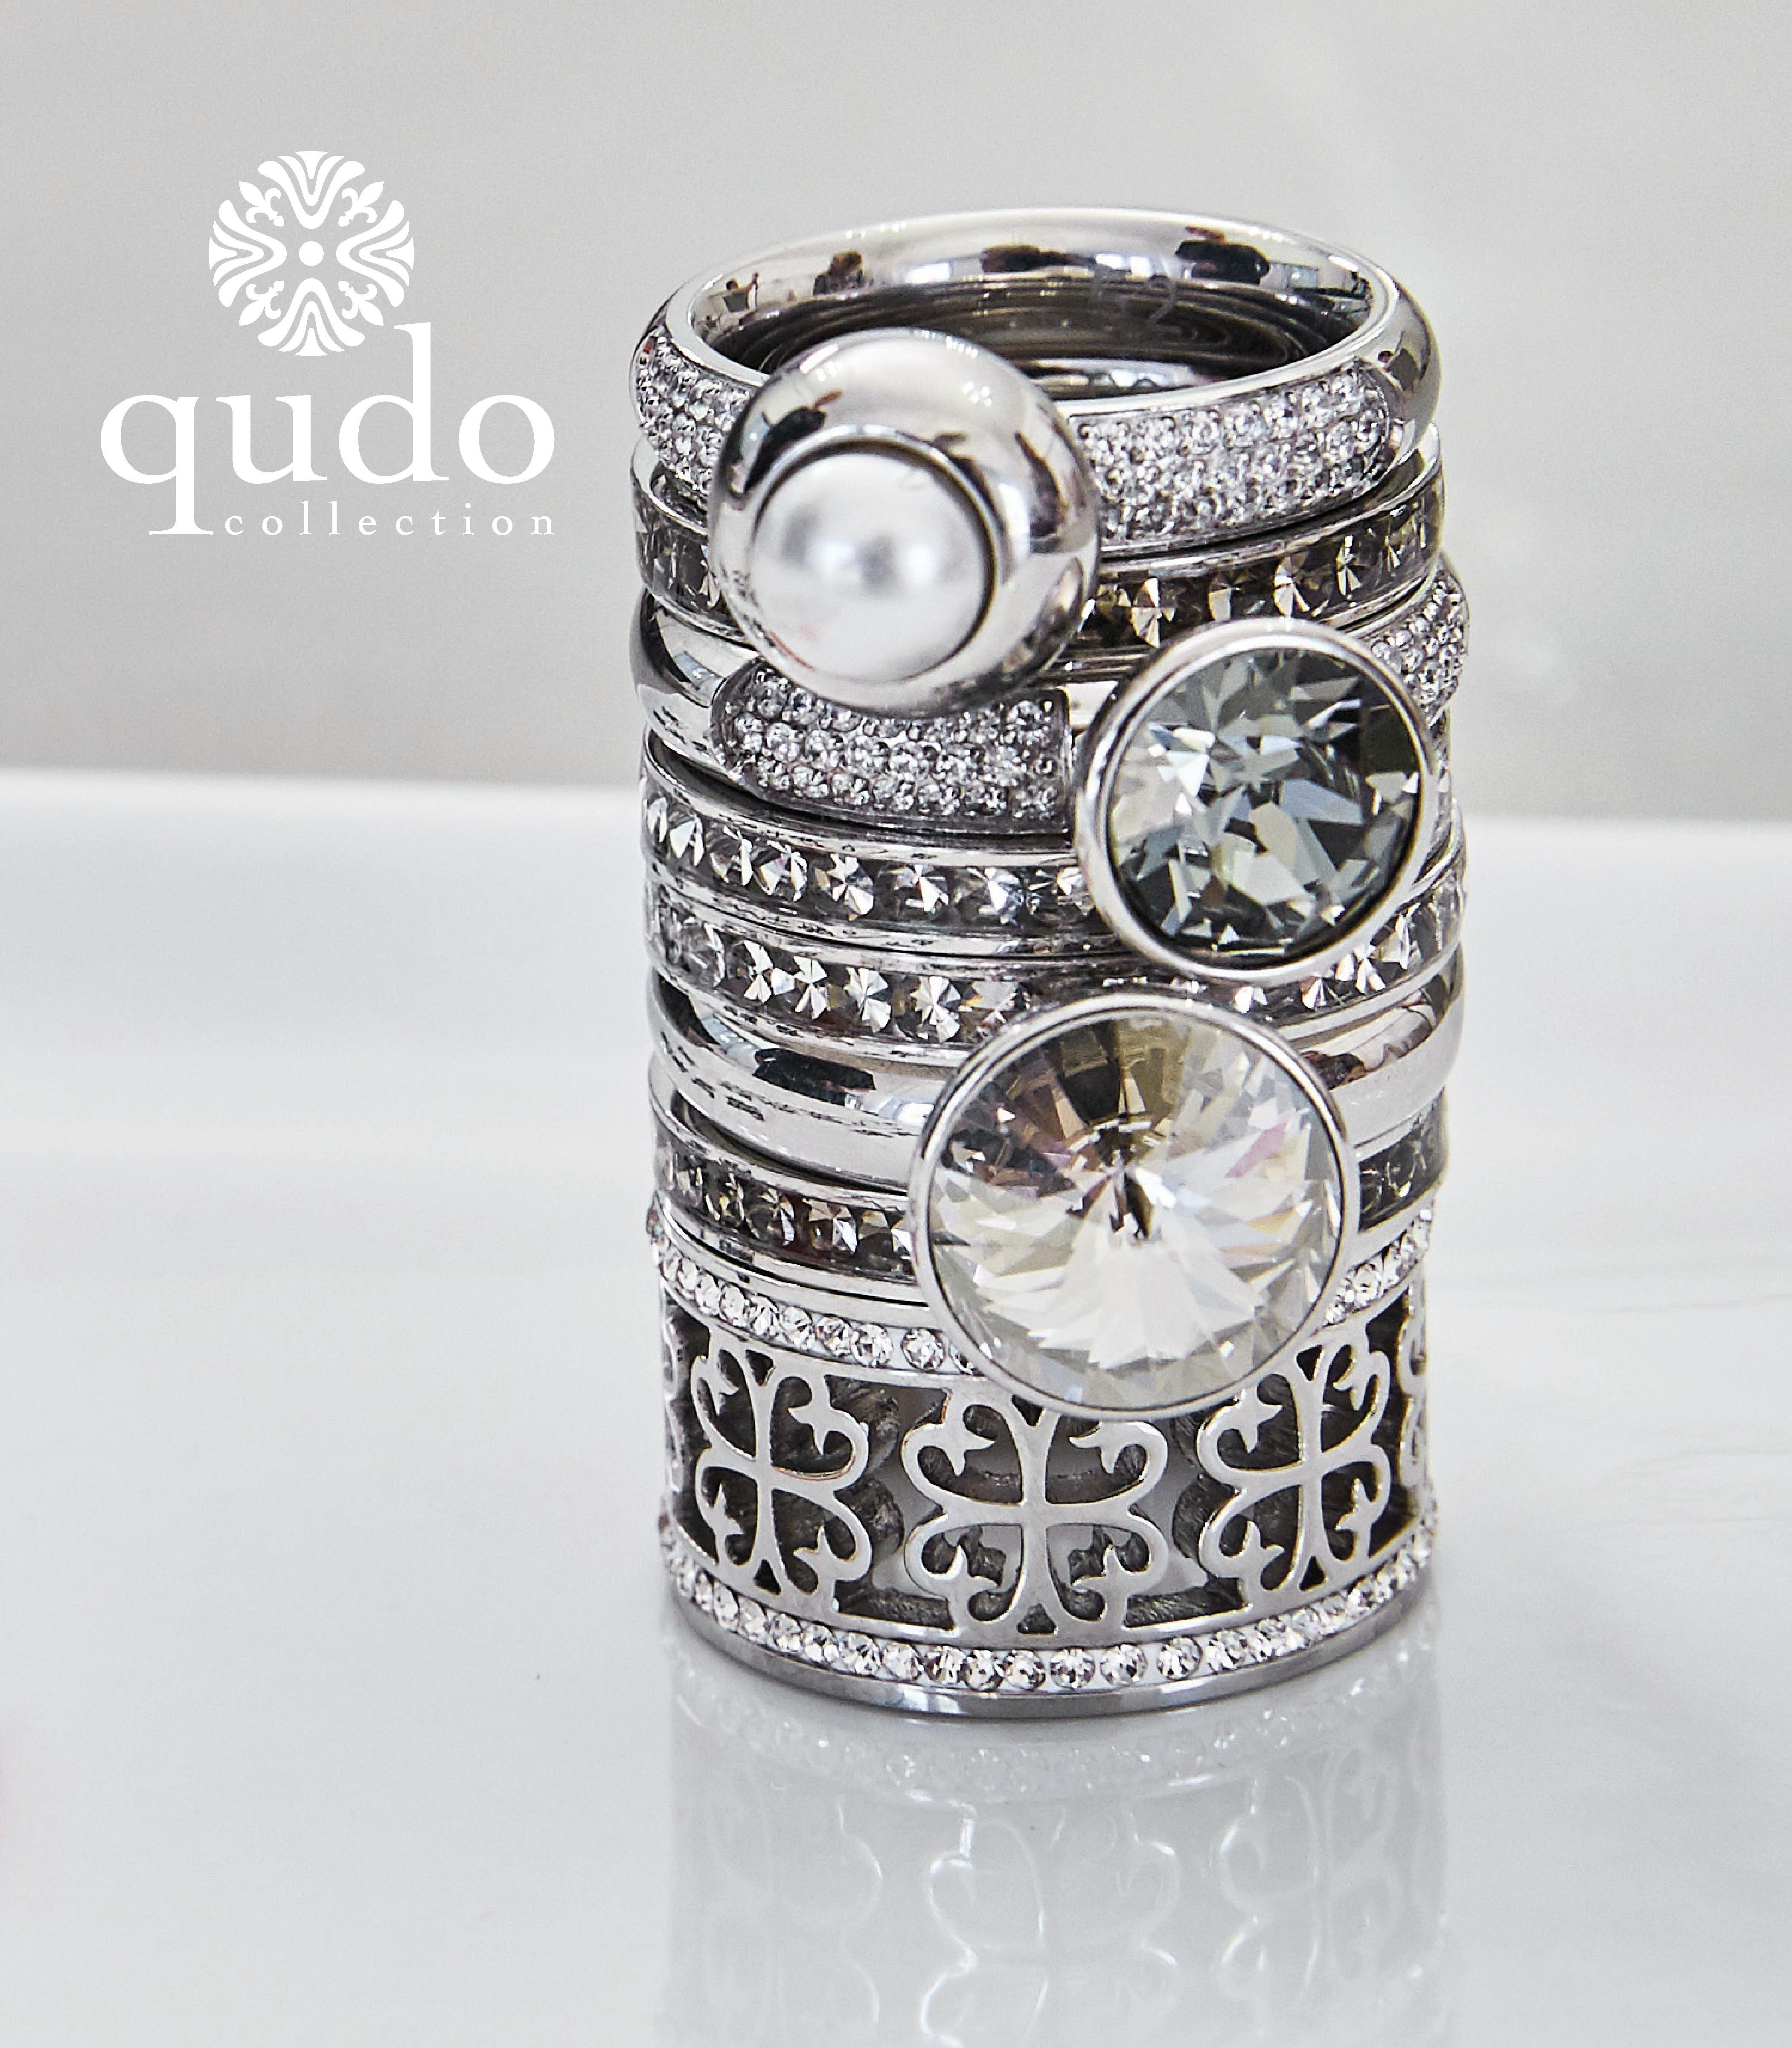 fa8df1c9e2d44 Come check out the Qudo line at Blocher Jewelers in Ellwood City, PA ...